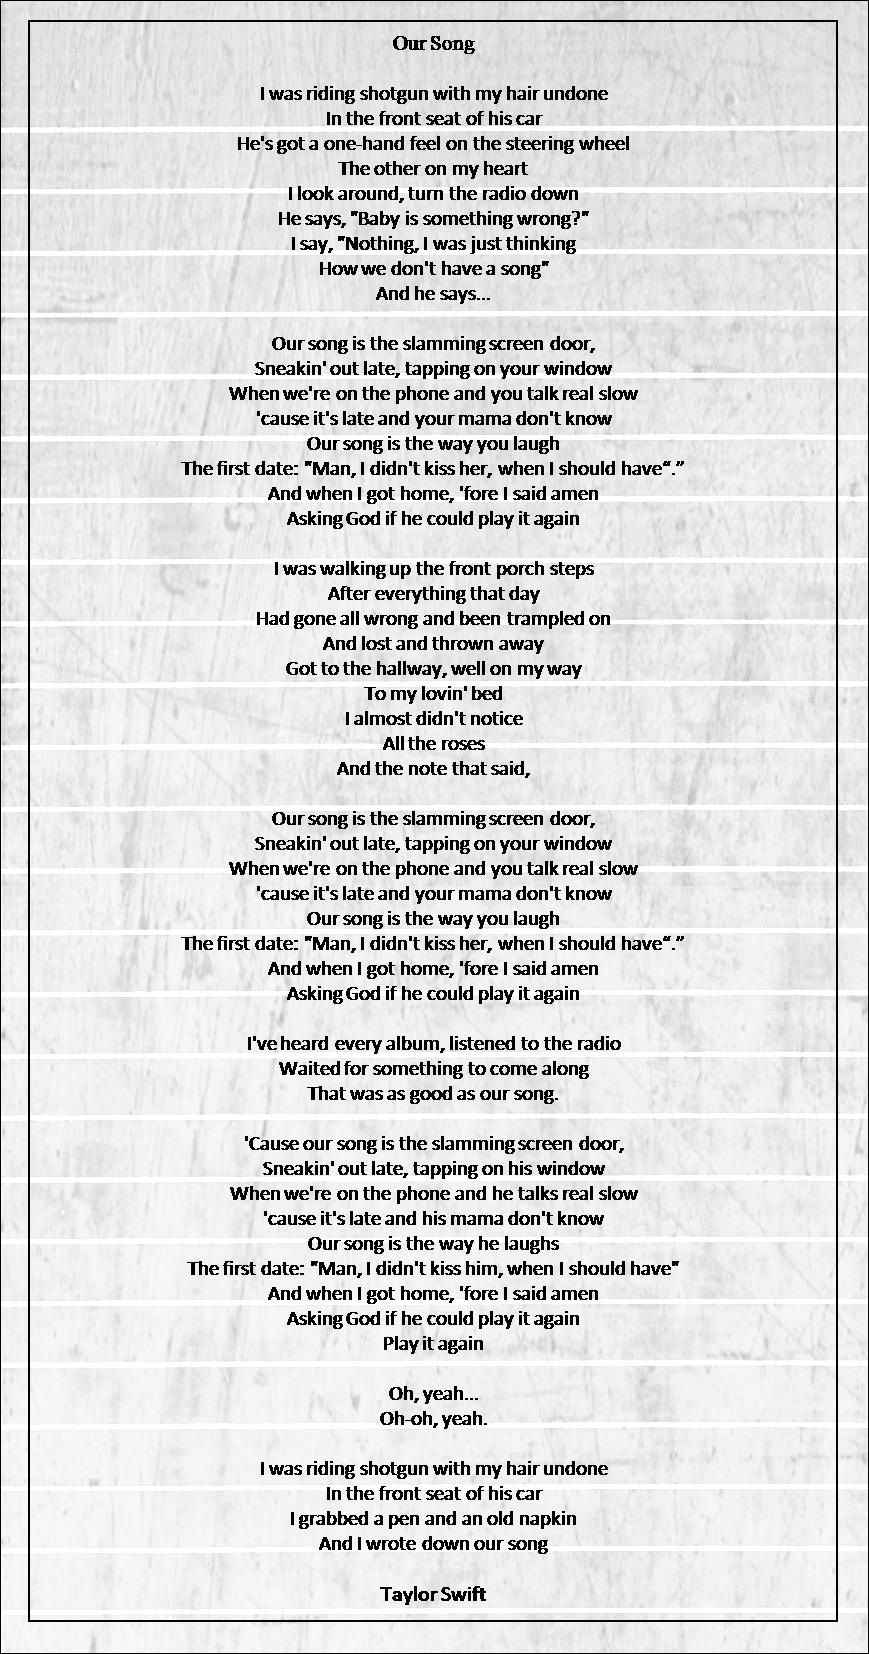 Our song taylor swift lyrics pinterest taylor swift songs our song taylor swift hexwebz Choice Image